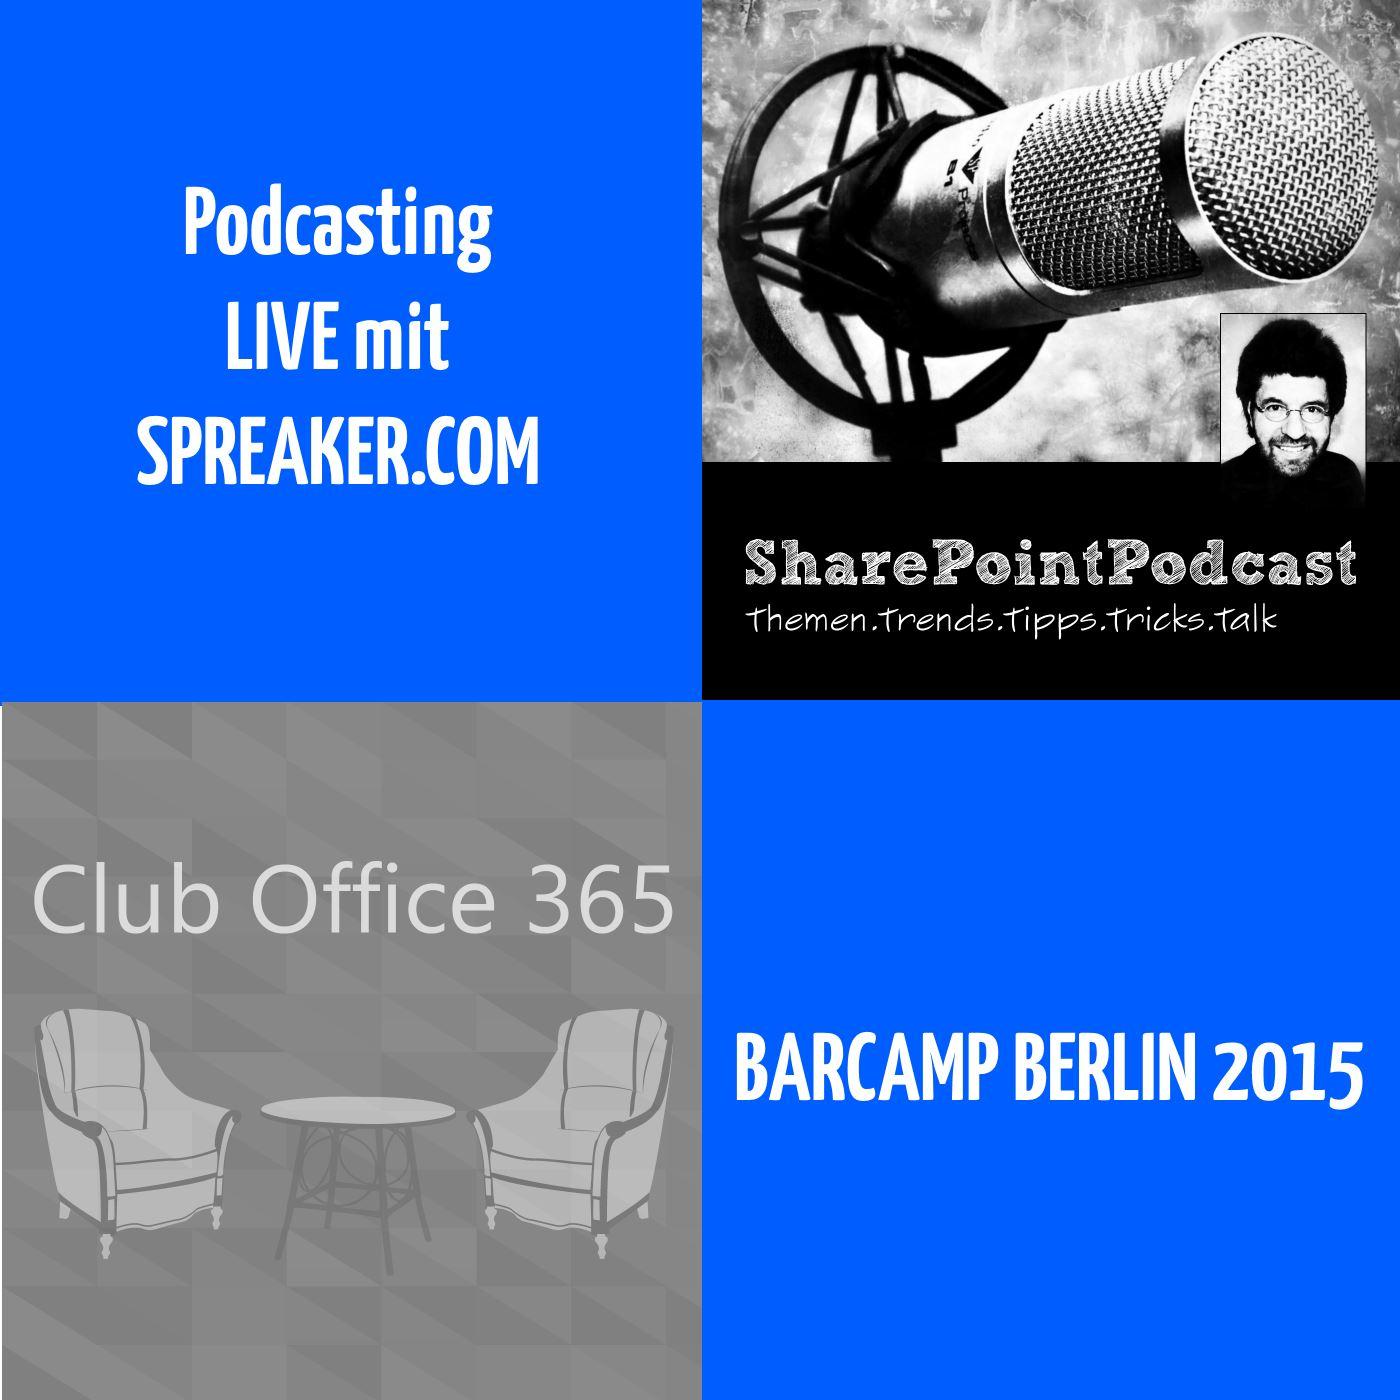 BarCamp Berlin 2015